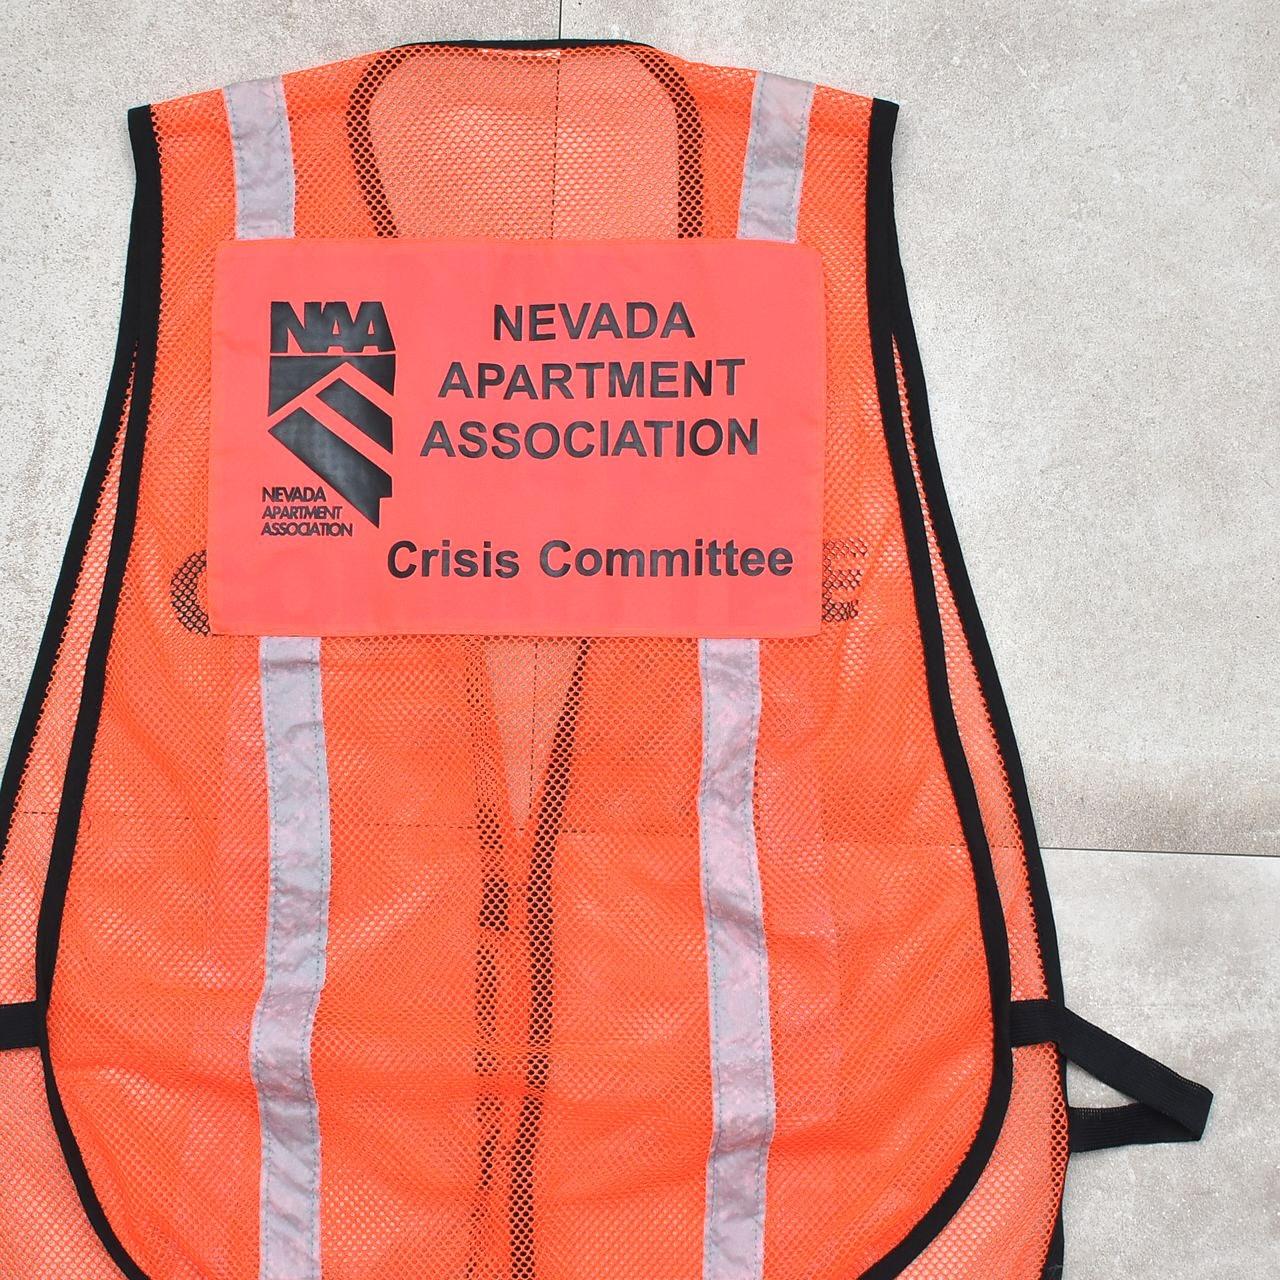 NAA crisis committee mesh security vest